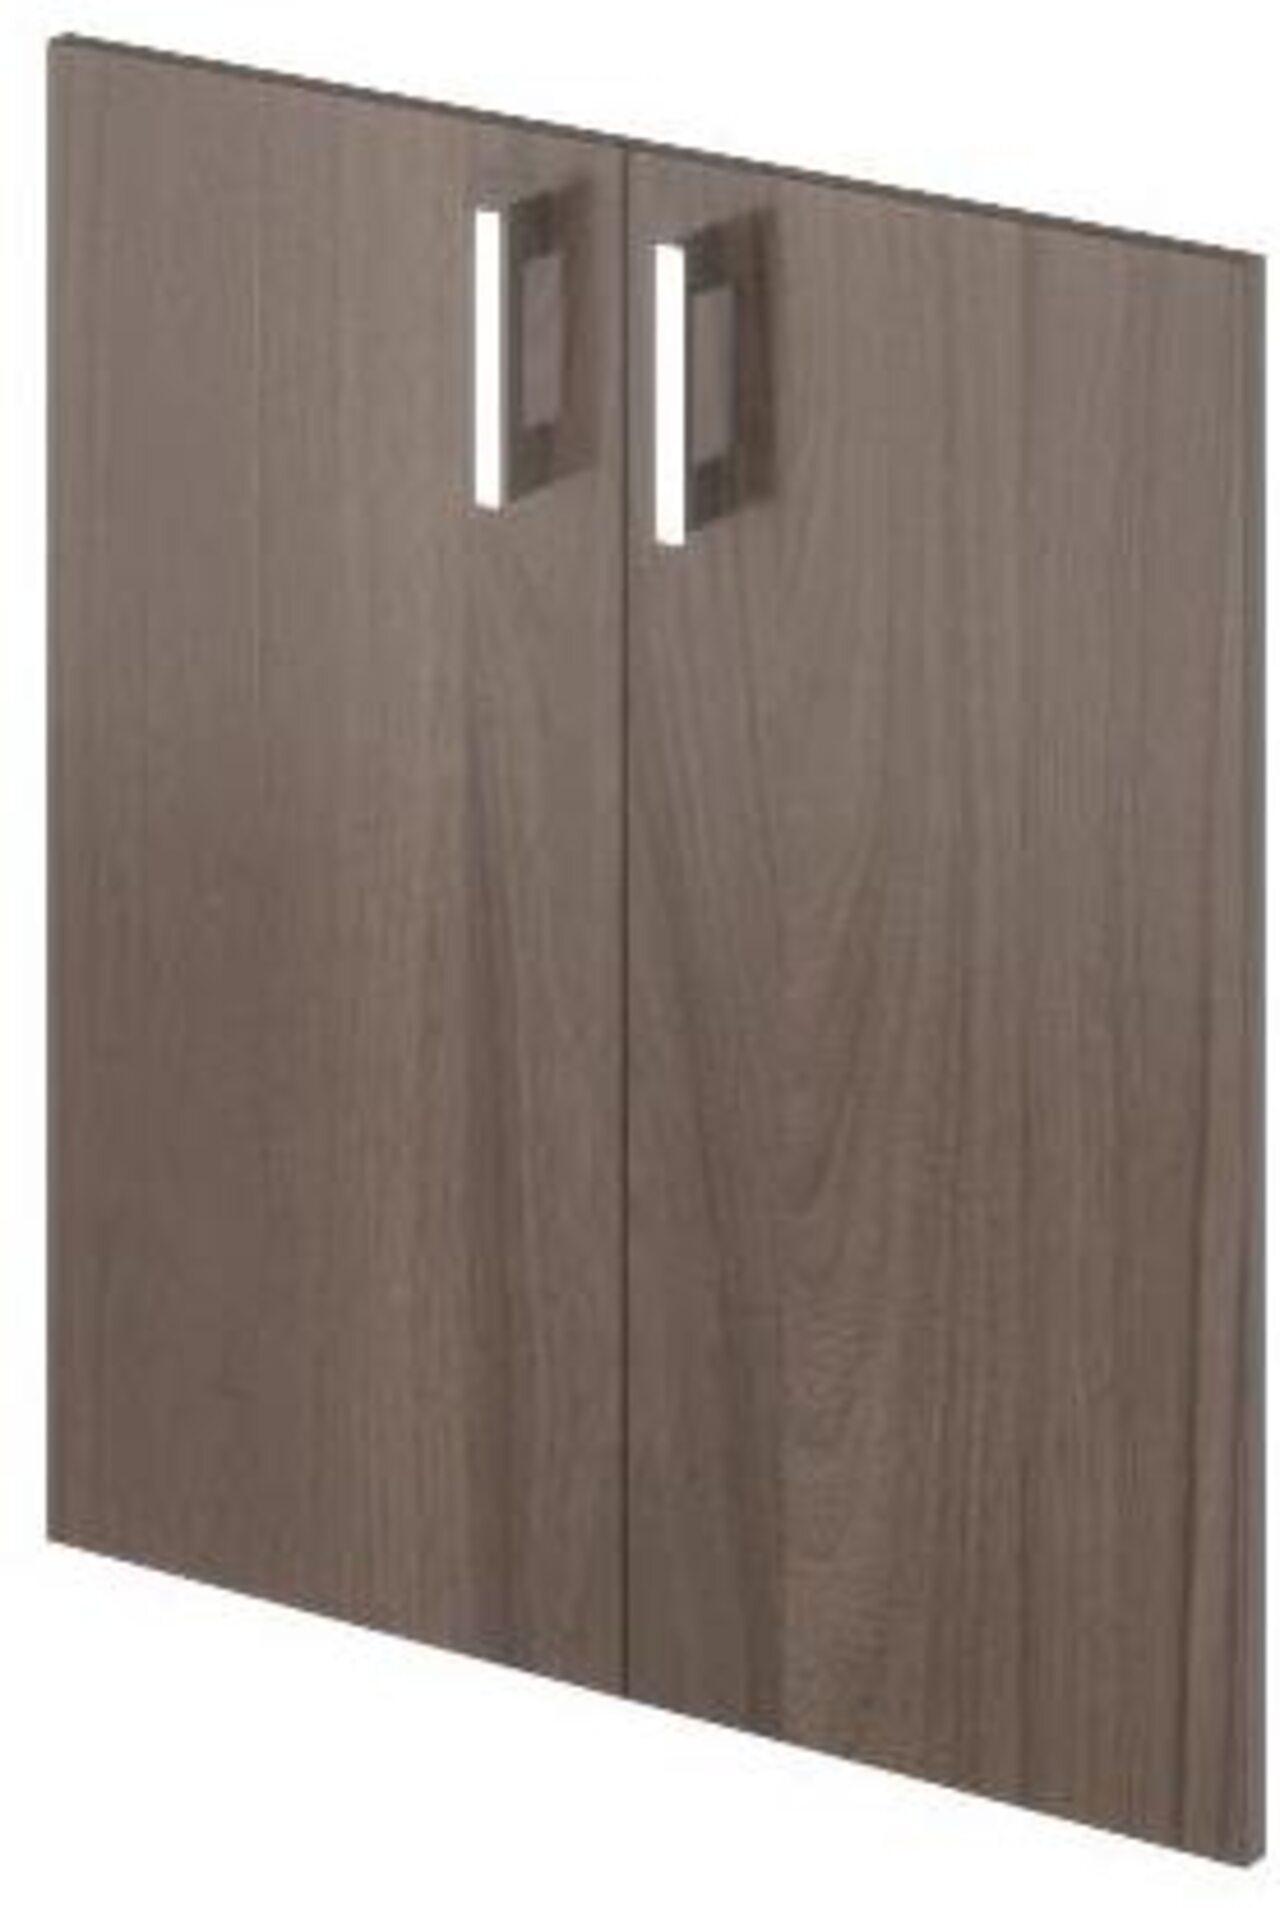 Двери для широких стеллажей - фото 4